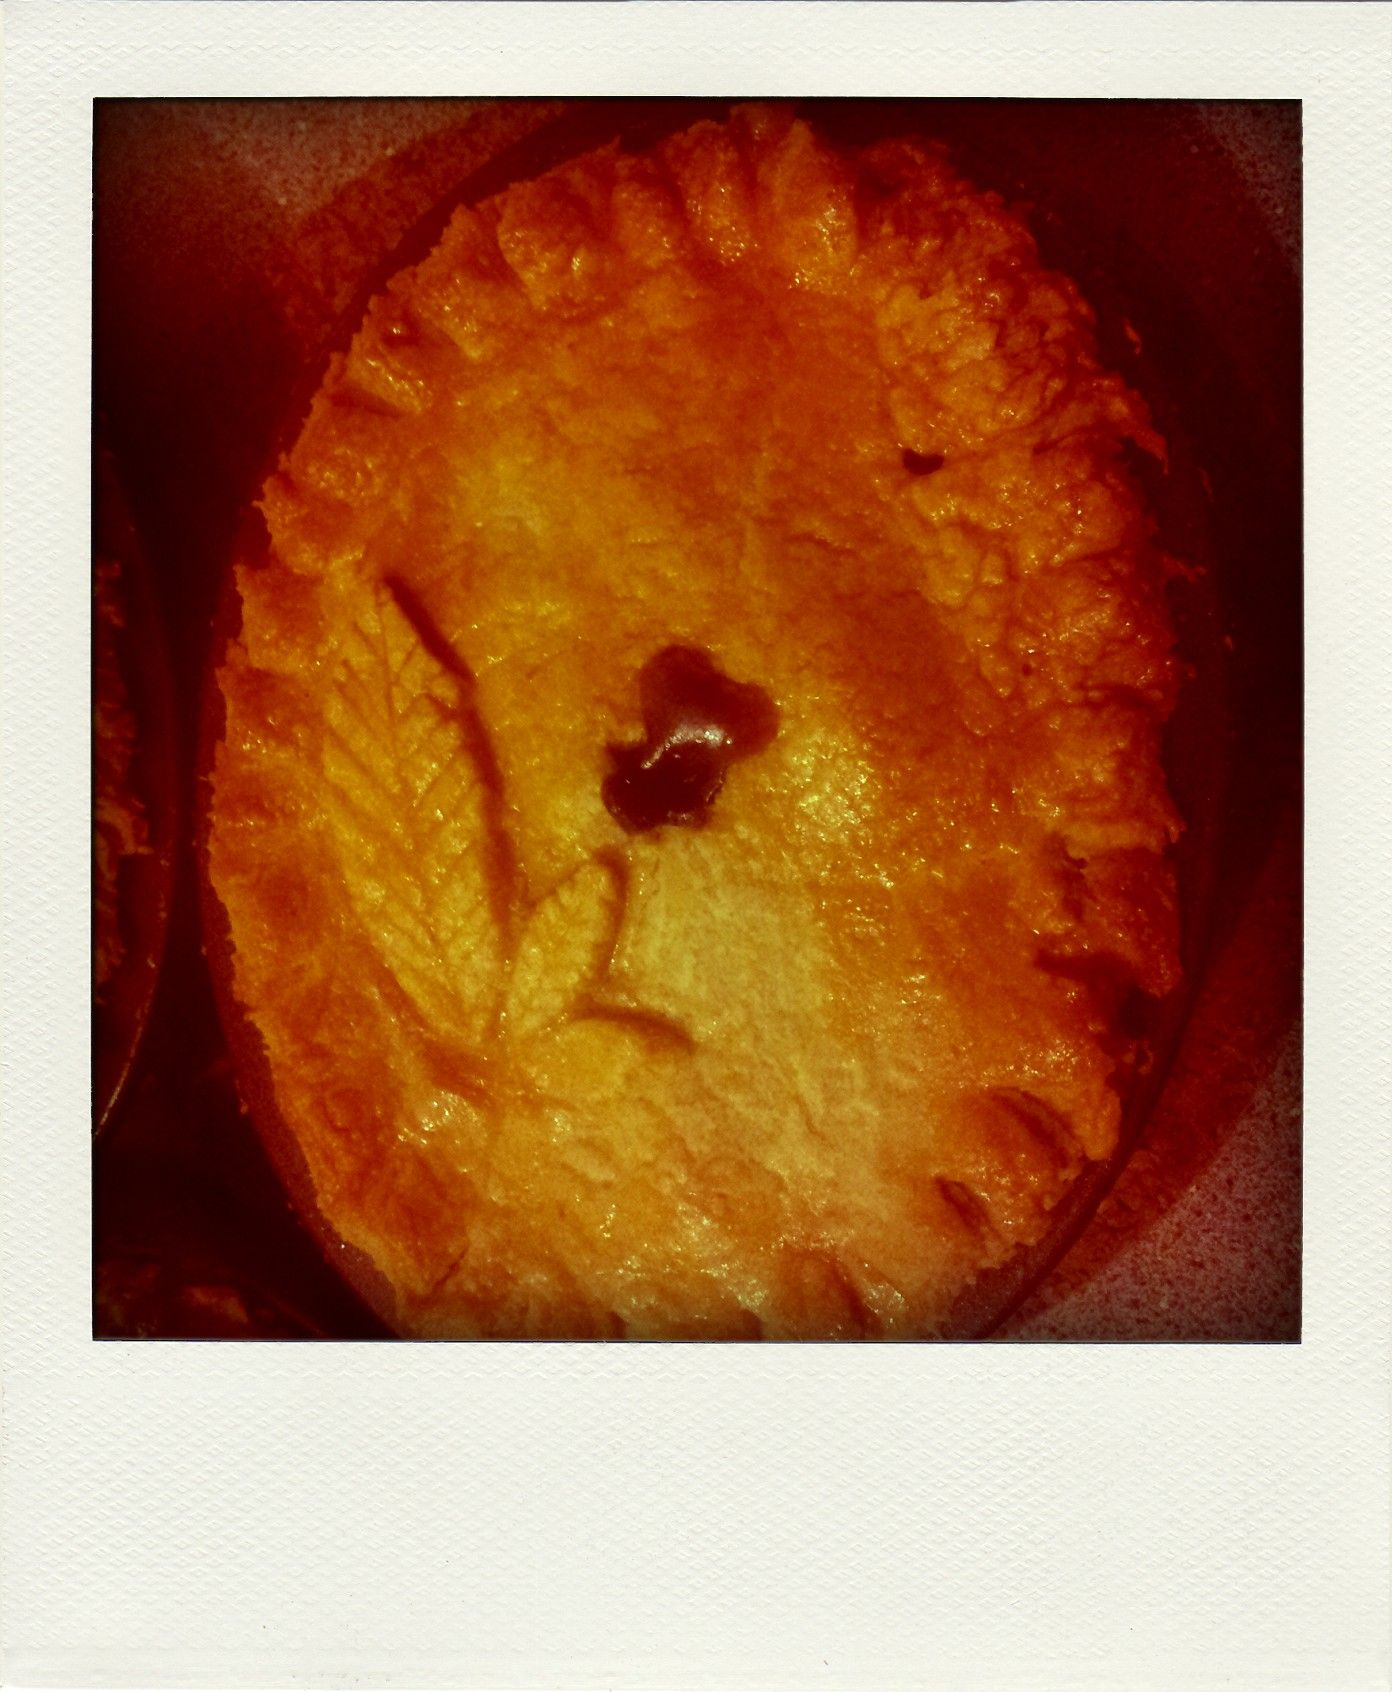 Steak Mushroom pie from the Hairy Bikers' cookbook! Sunday ...